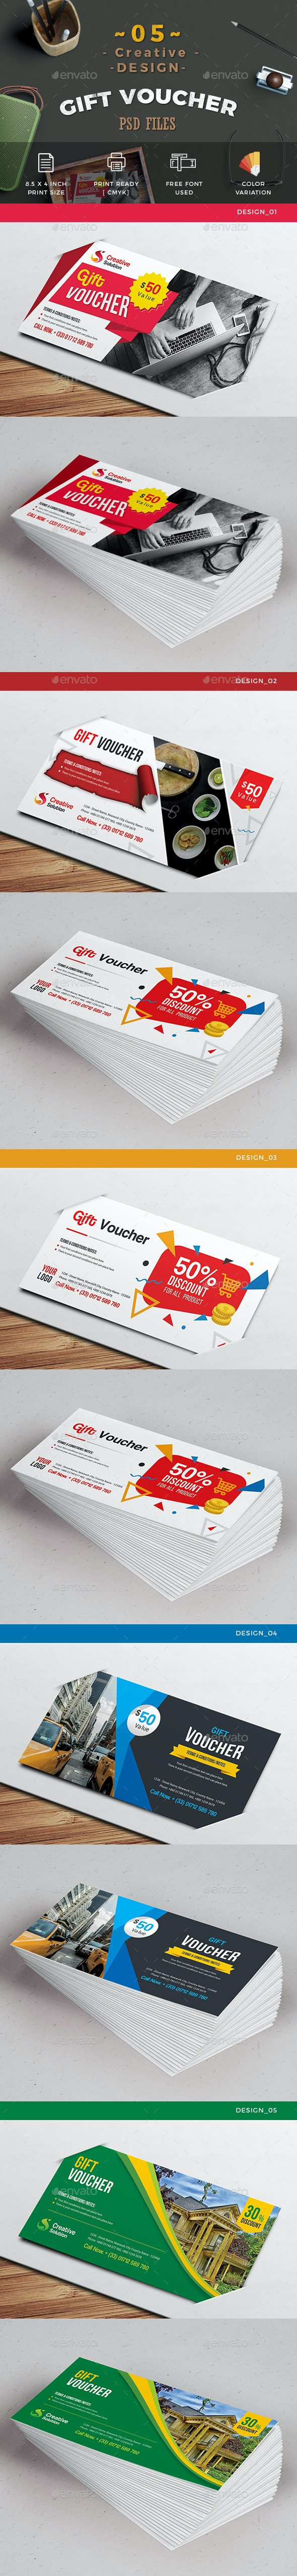 5_Design Gift Voucher - Cards & Invites Print Templates